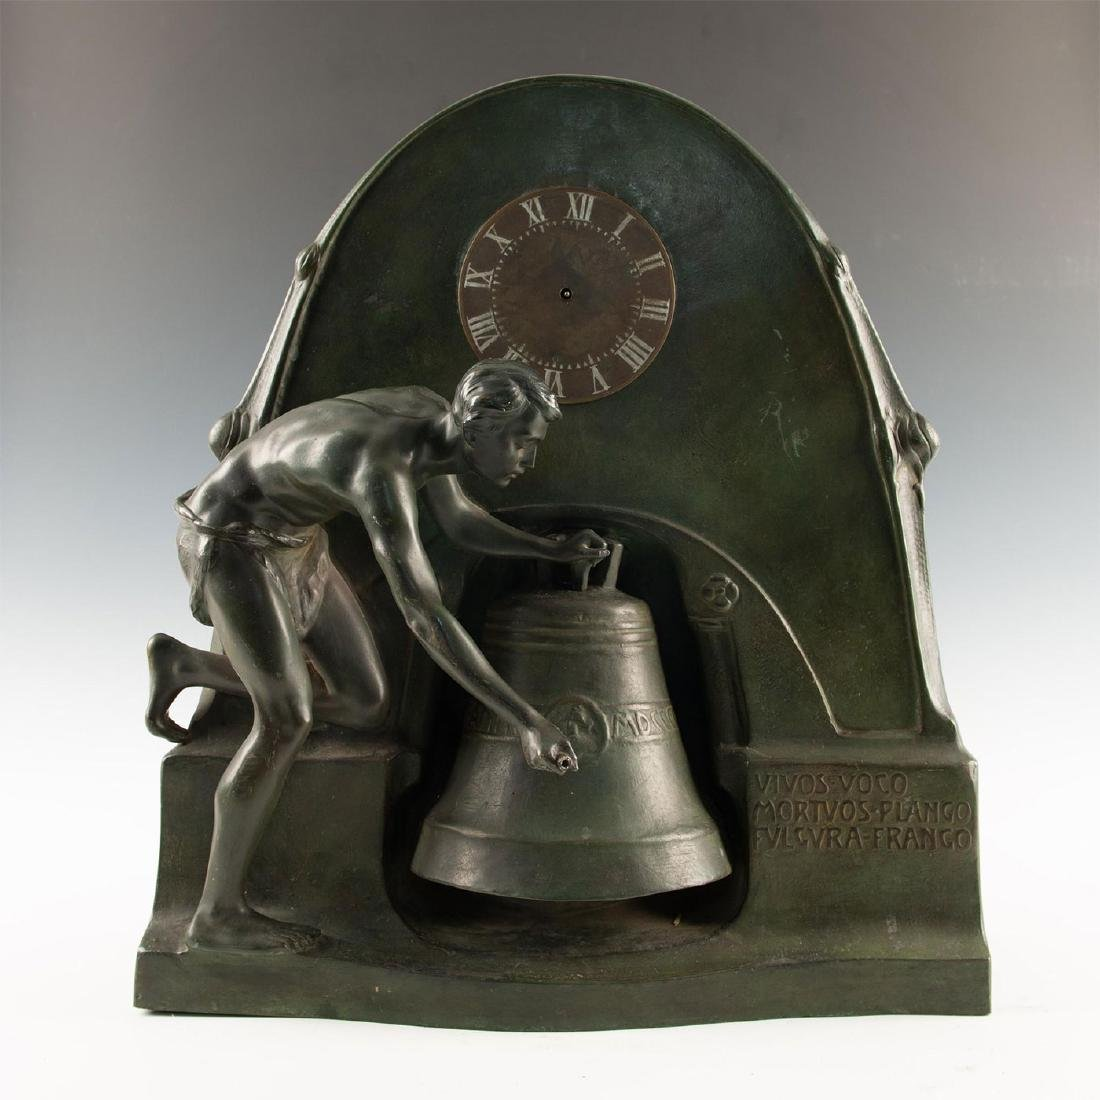 EARLY 20TH CENTURY ART NOUVEAU BRONZE CLOCK, AFTER